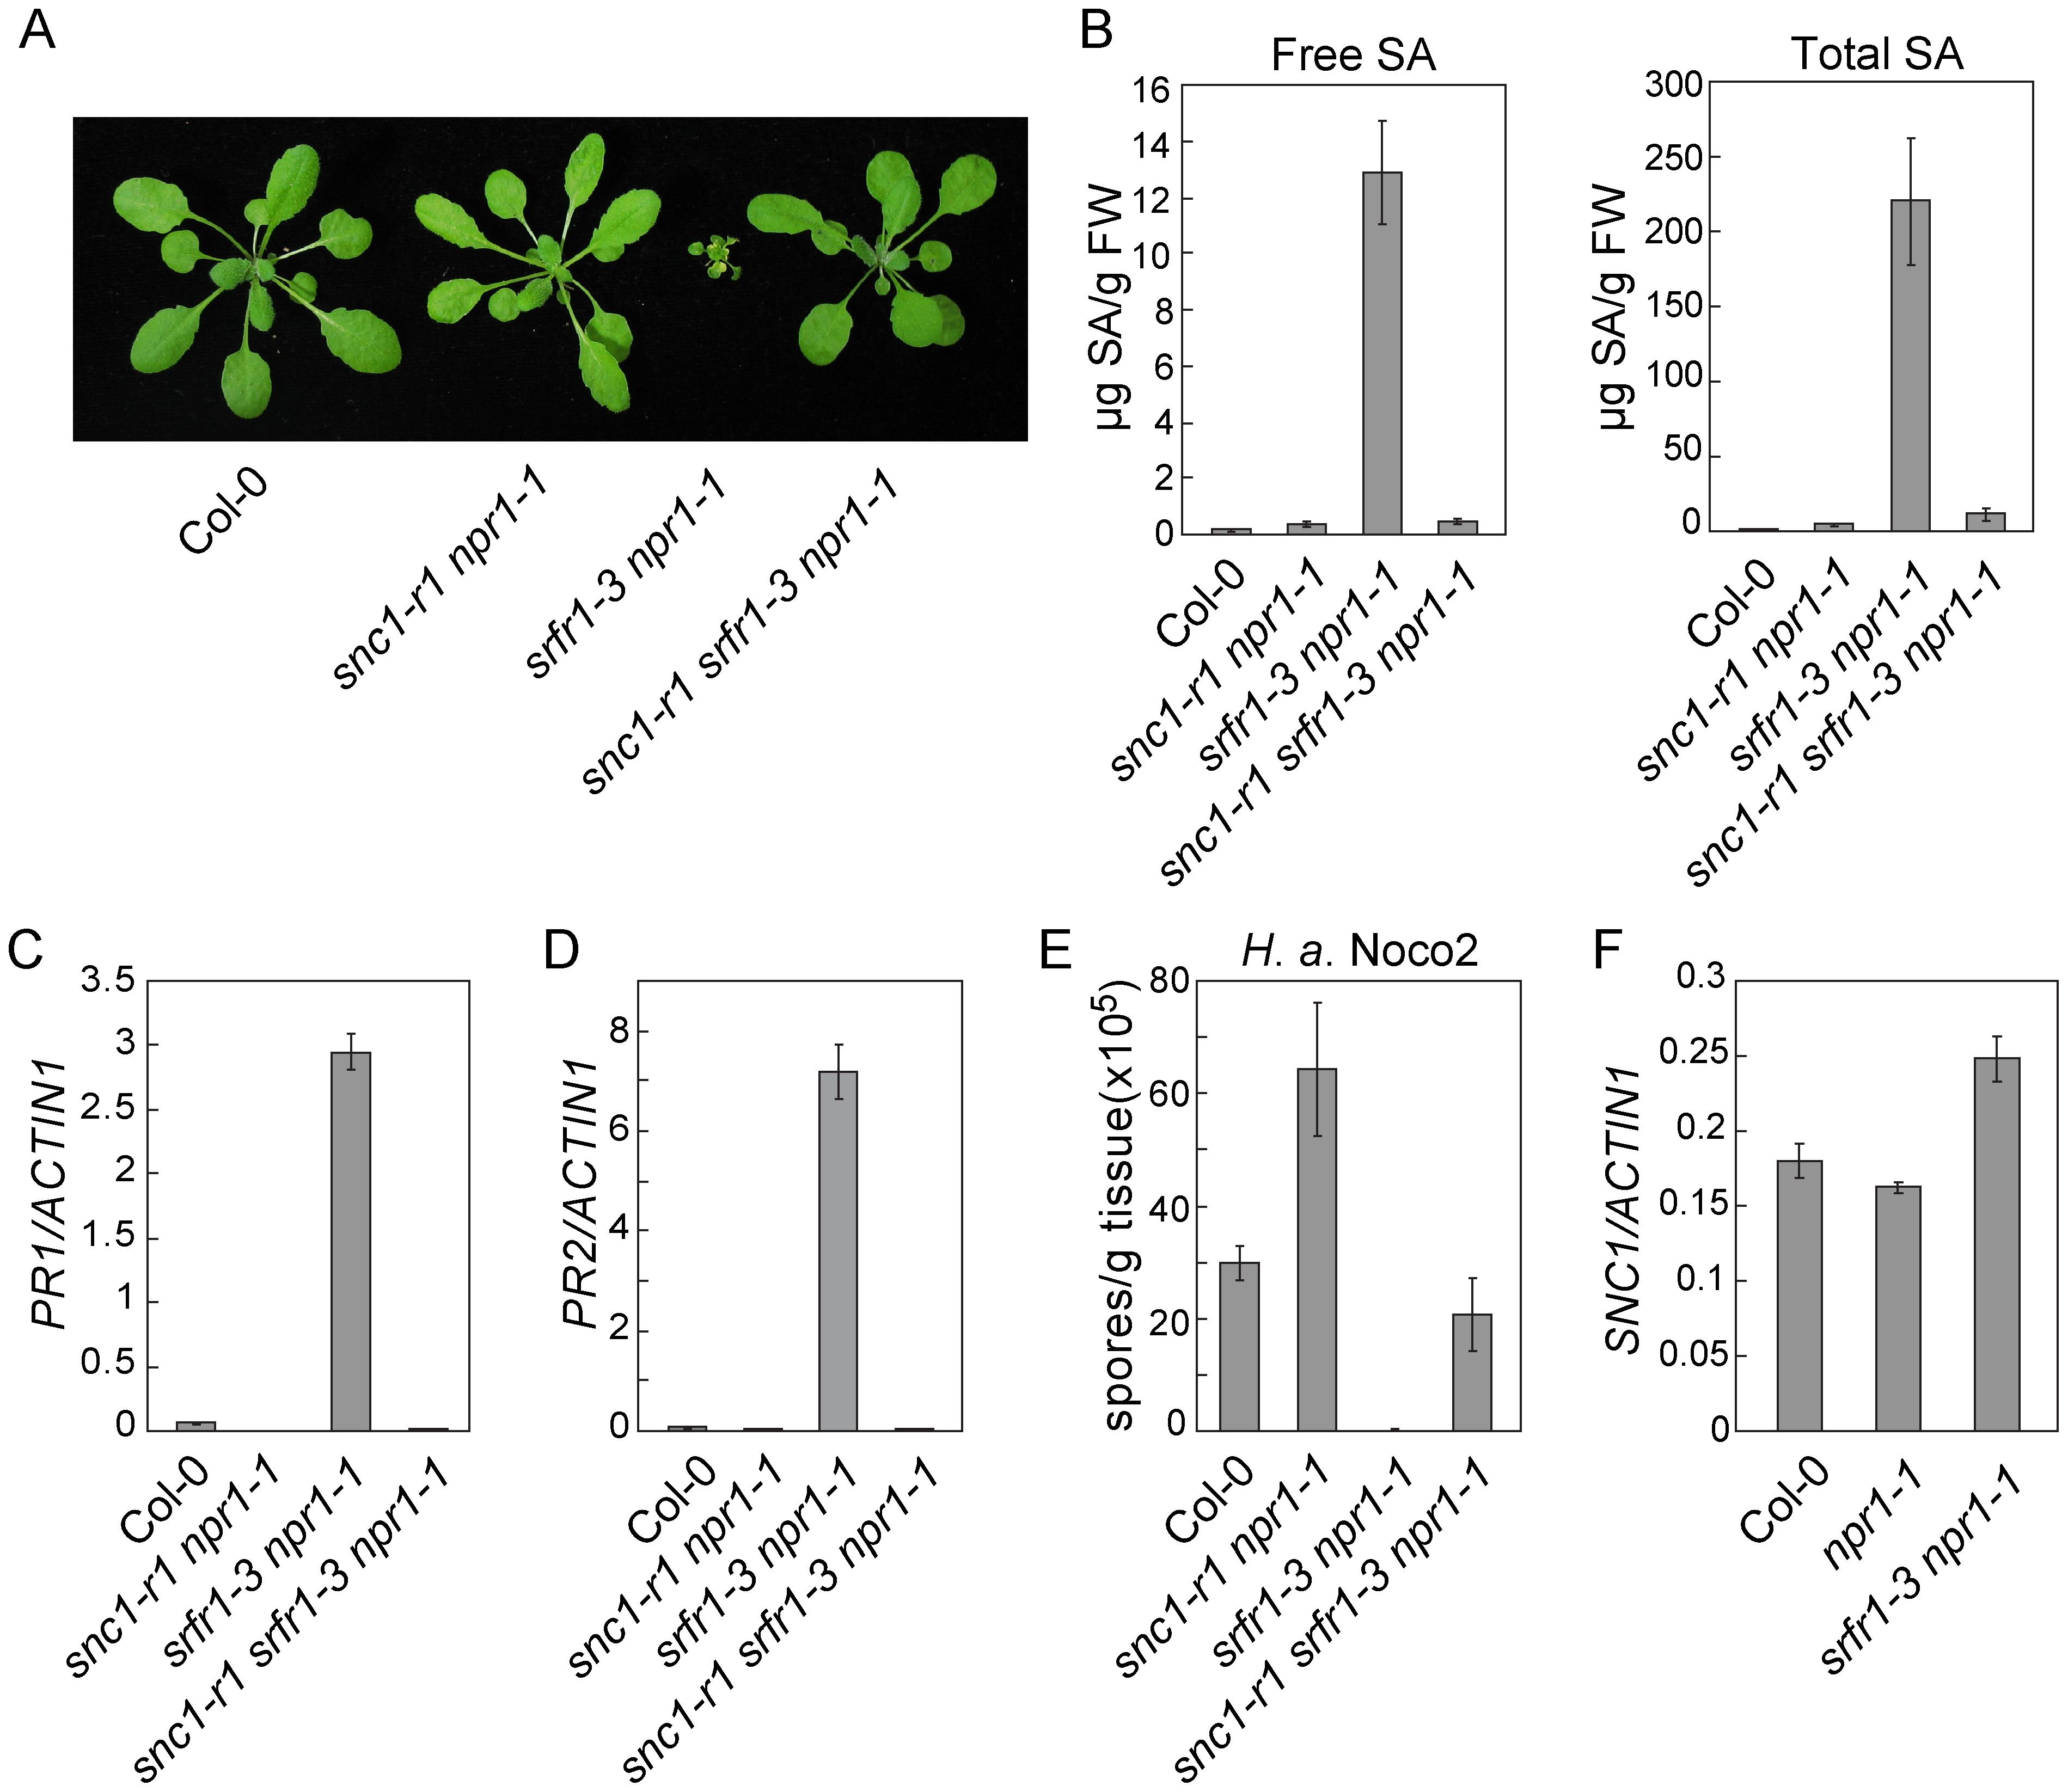 Loss of <i>SNC1</i> function suppresses constitutive defense responses in <i>snc5-1</i>/<i>srfr1-3</i>.